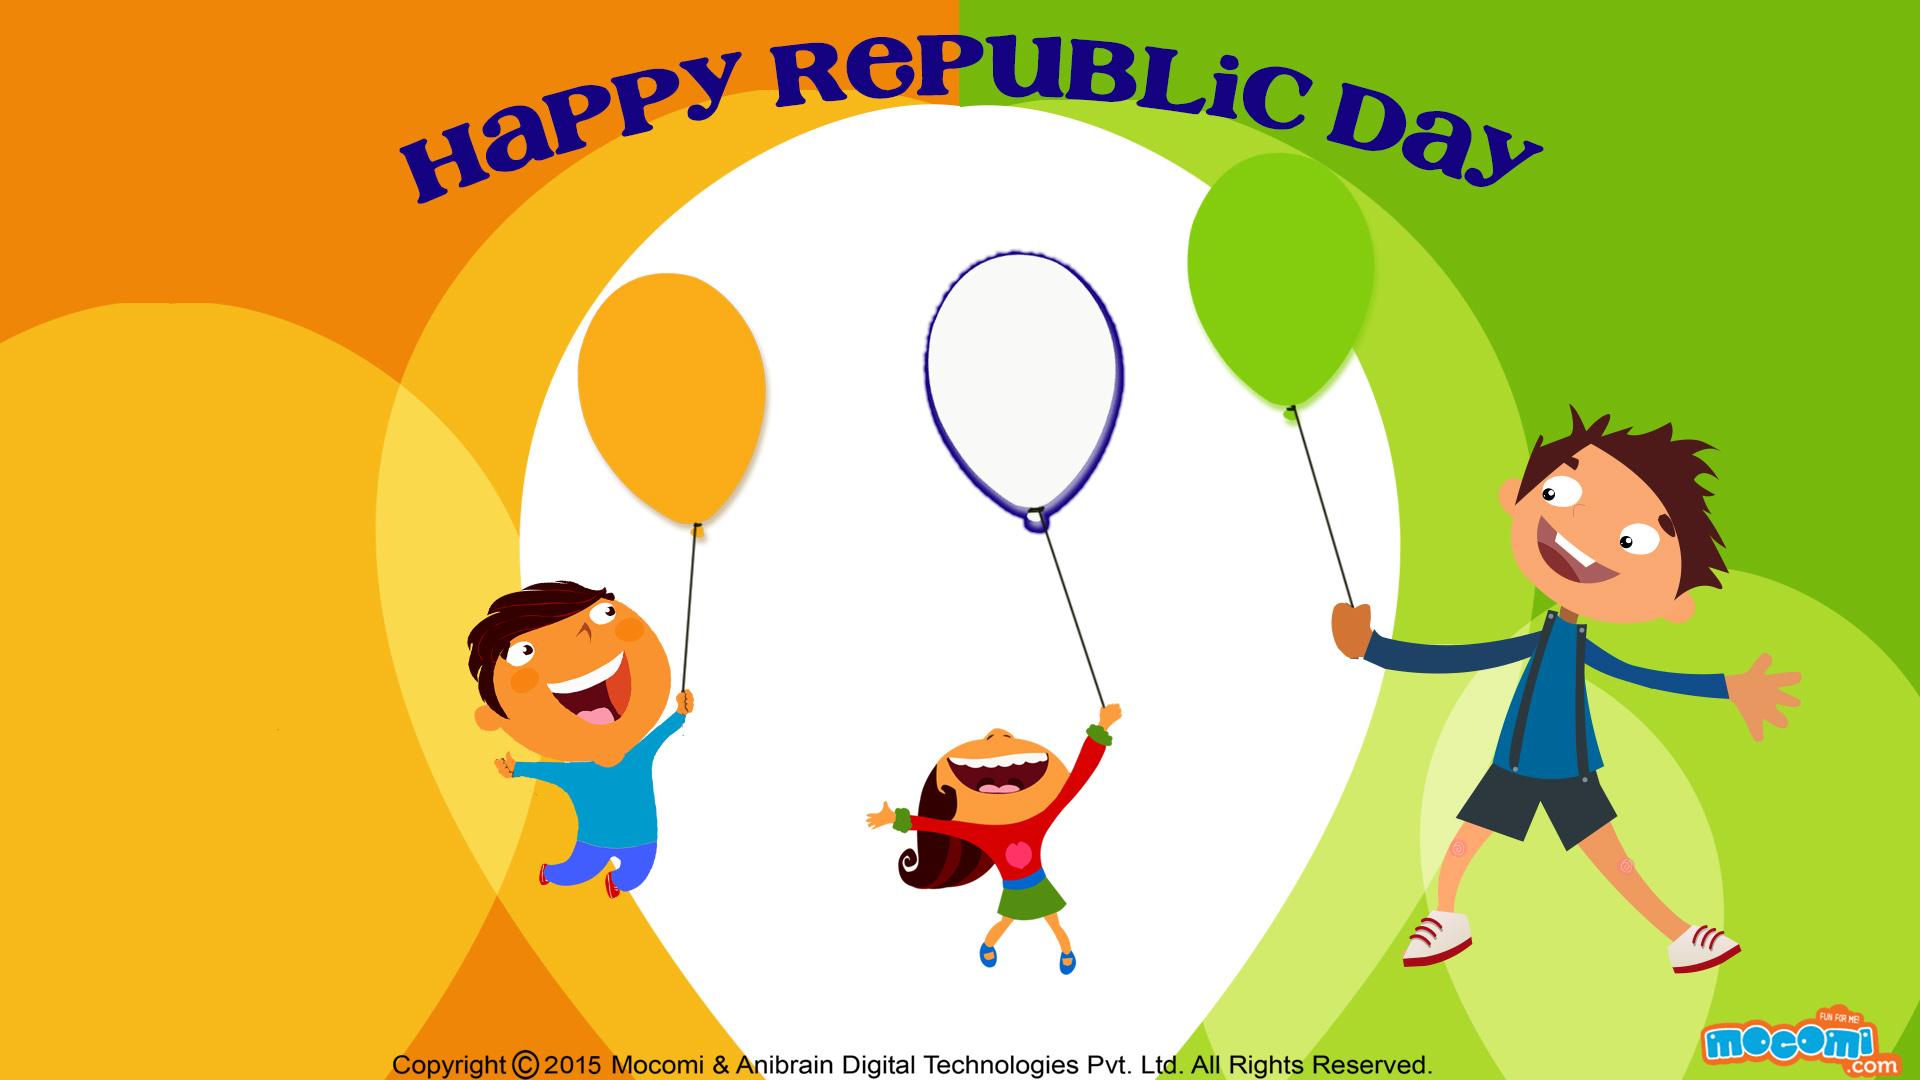 Happy Republic Day Wallpaper – 10